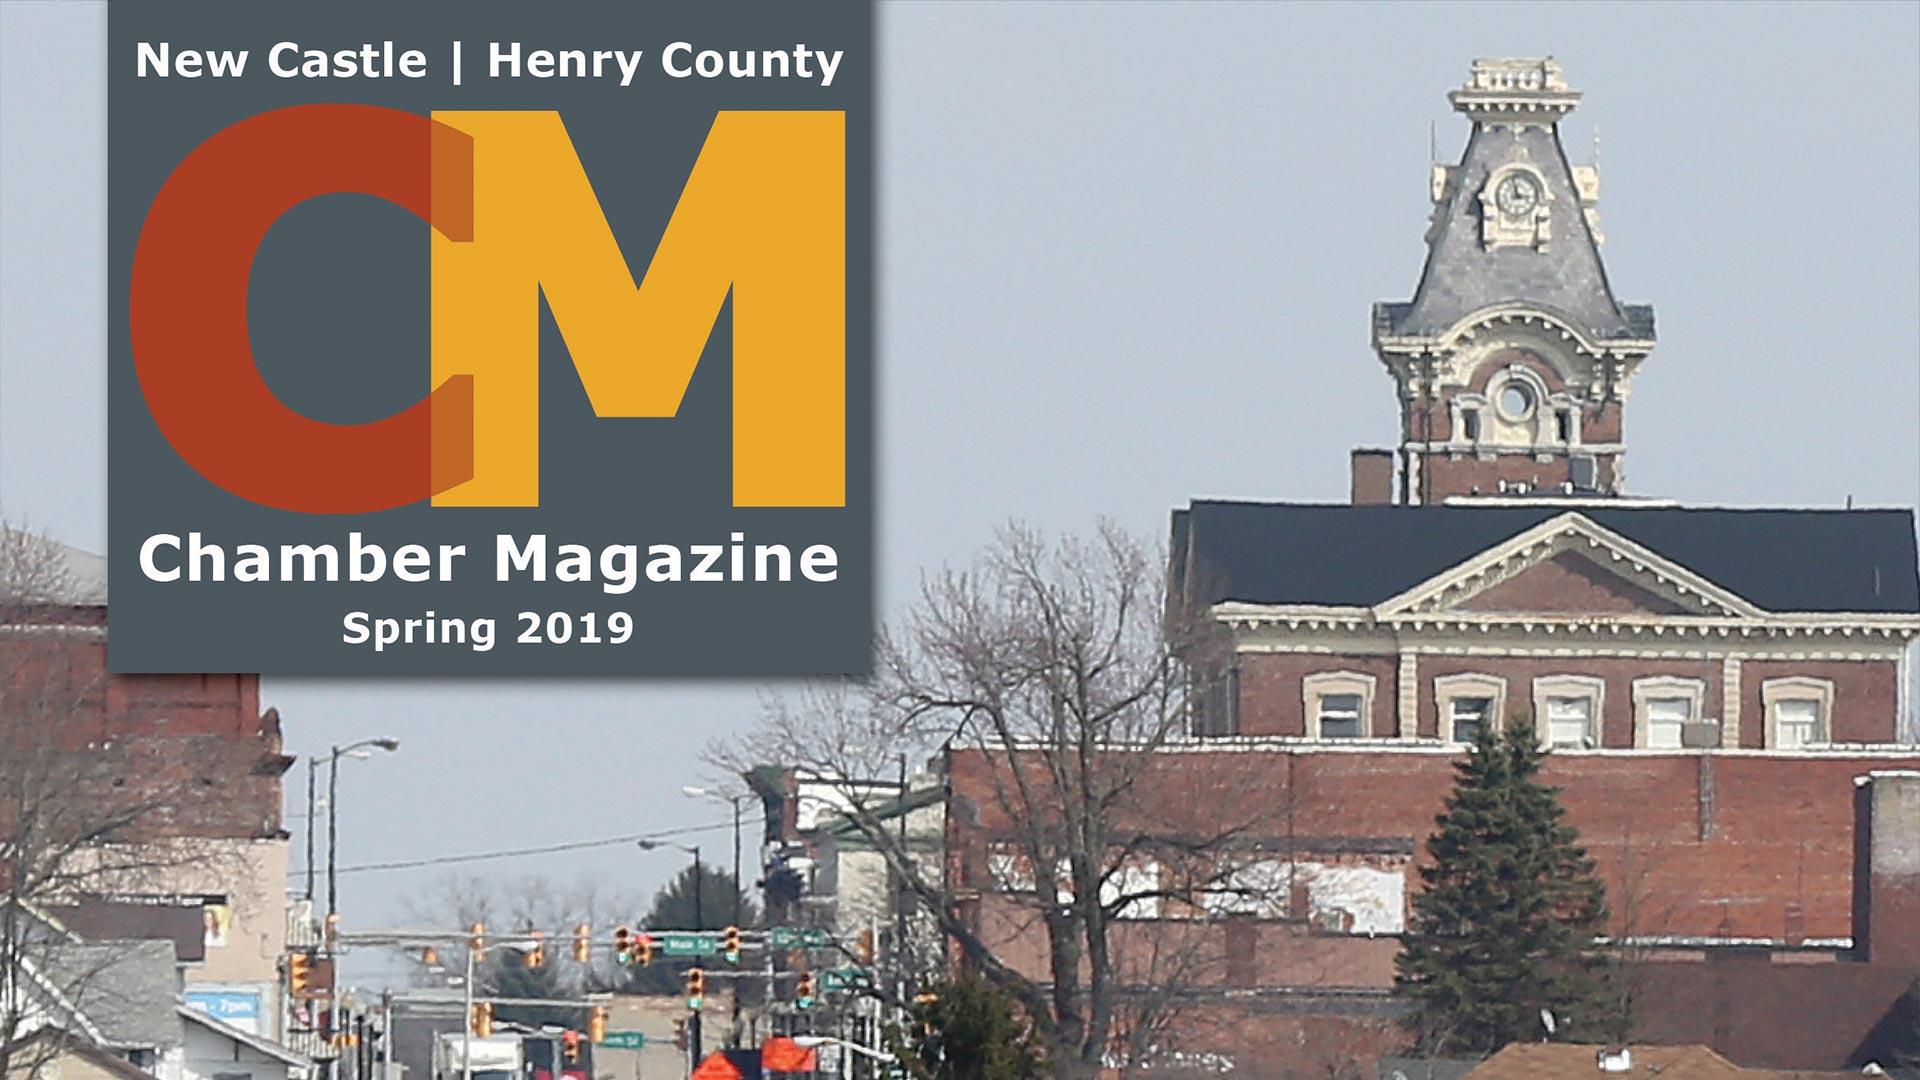 NCHC Chamber Magazine: Spring 2019